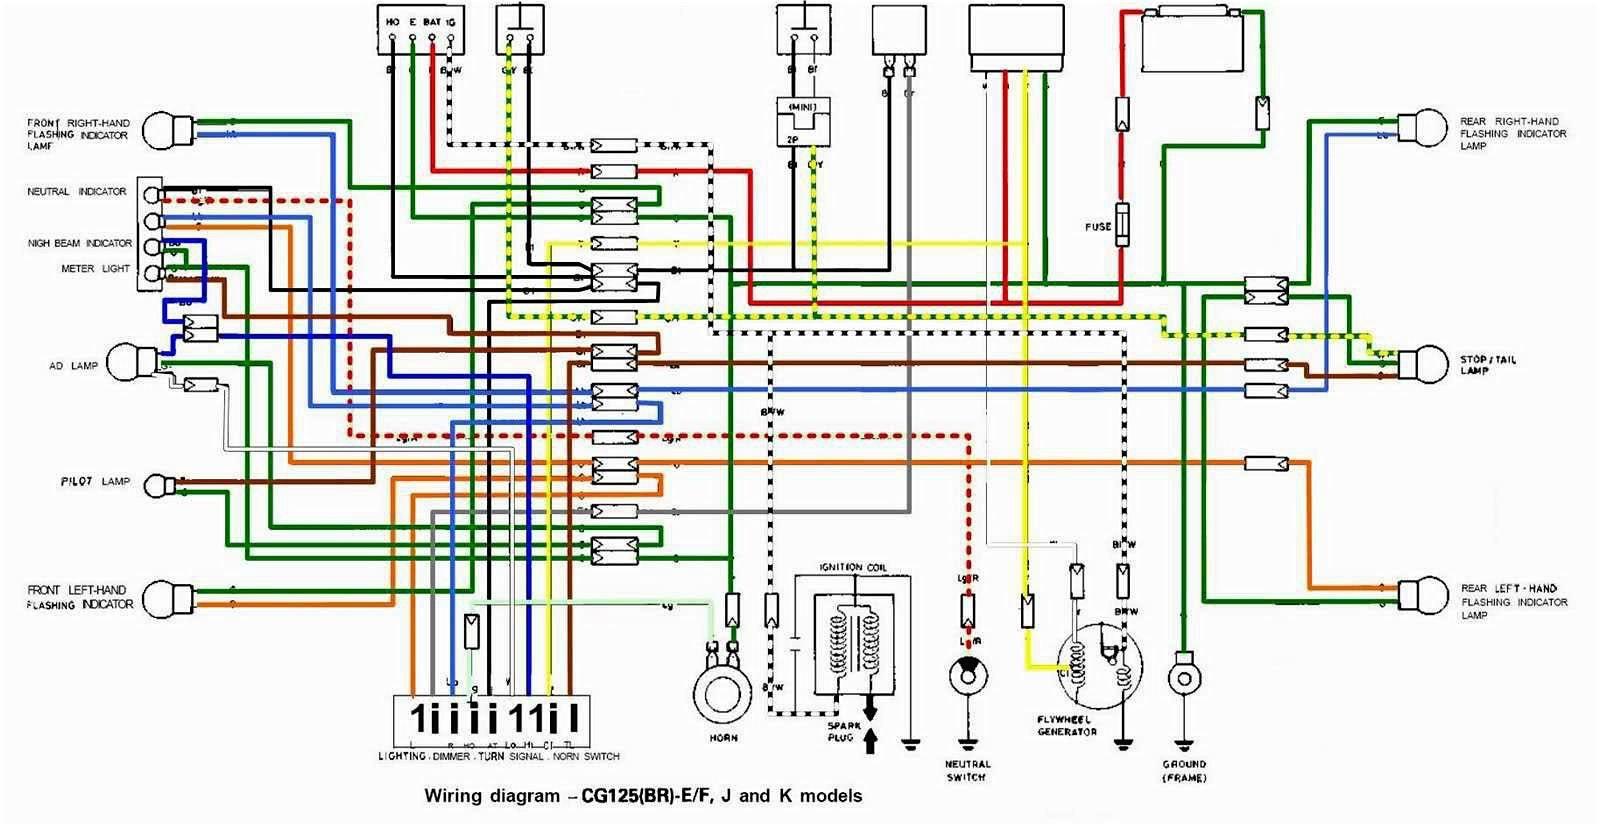 lifan 70cc stator wiring diagram complete wiring diagrams u2022 rh oldorchardfarm co